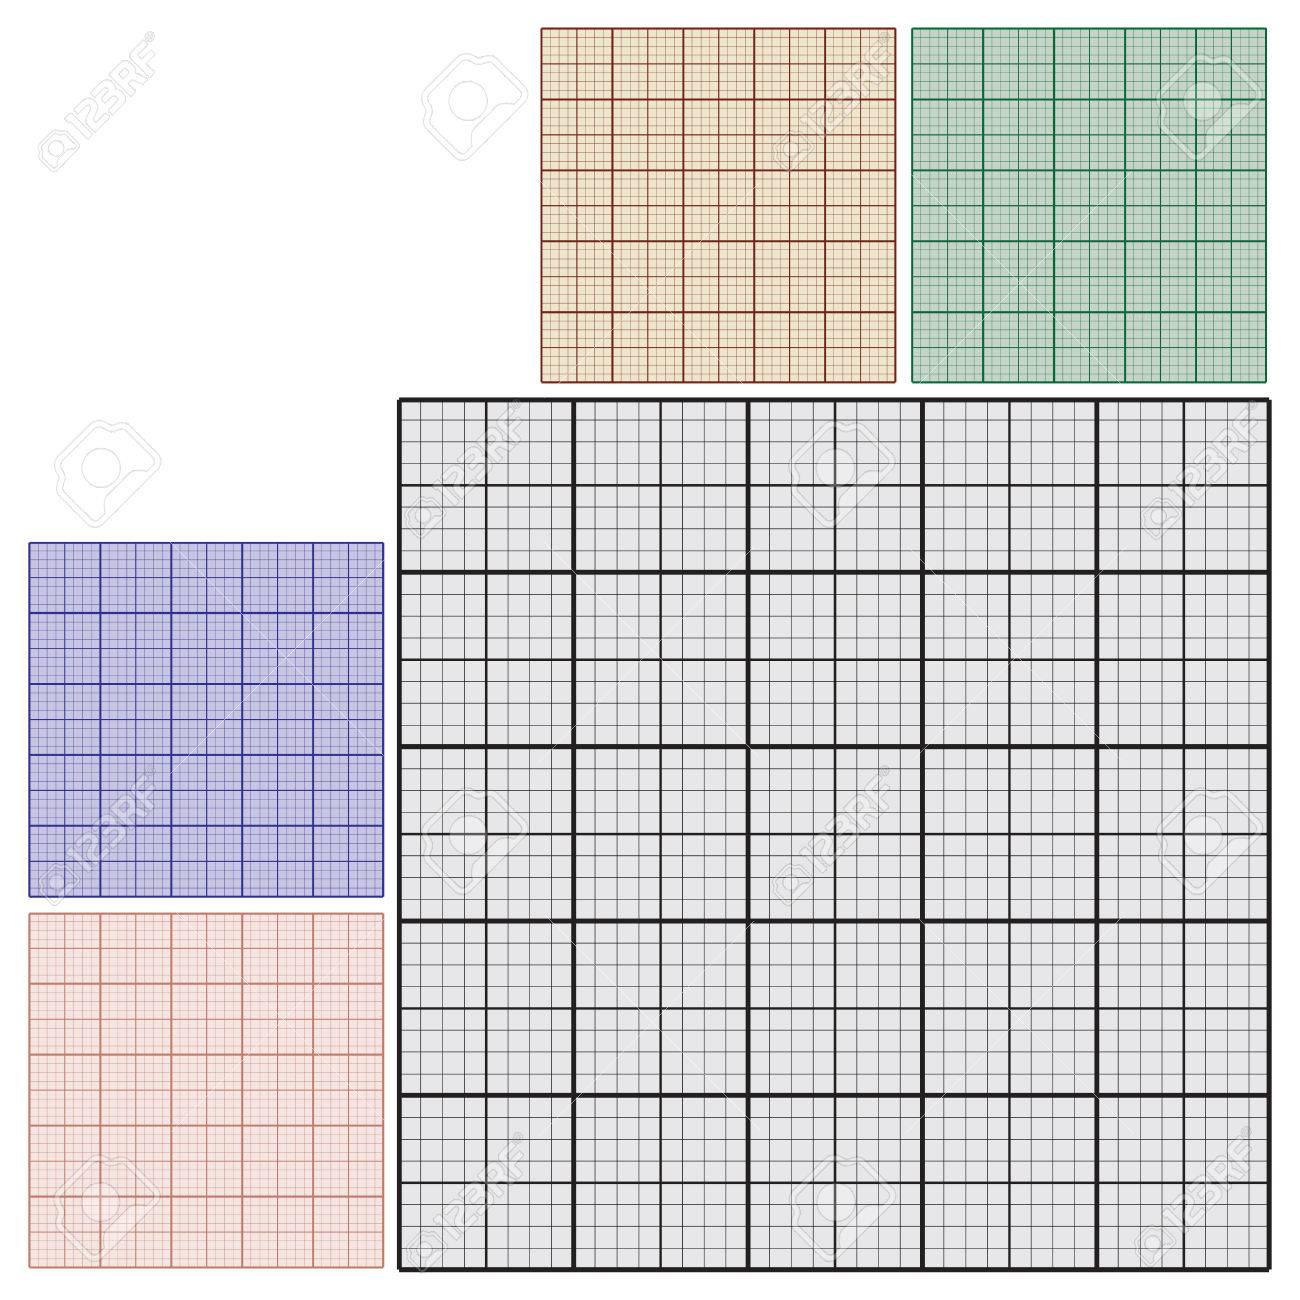 technical graph paper - Yeni.mescale.co